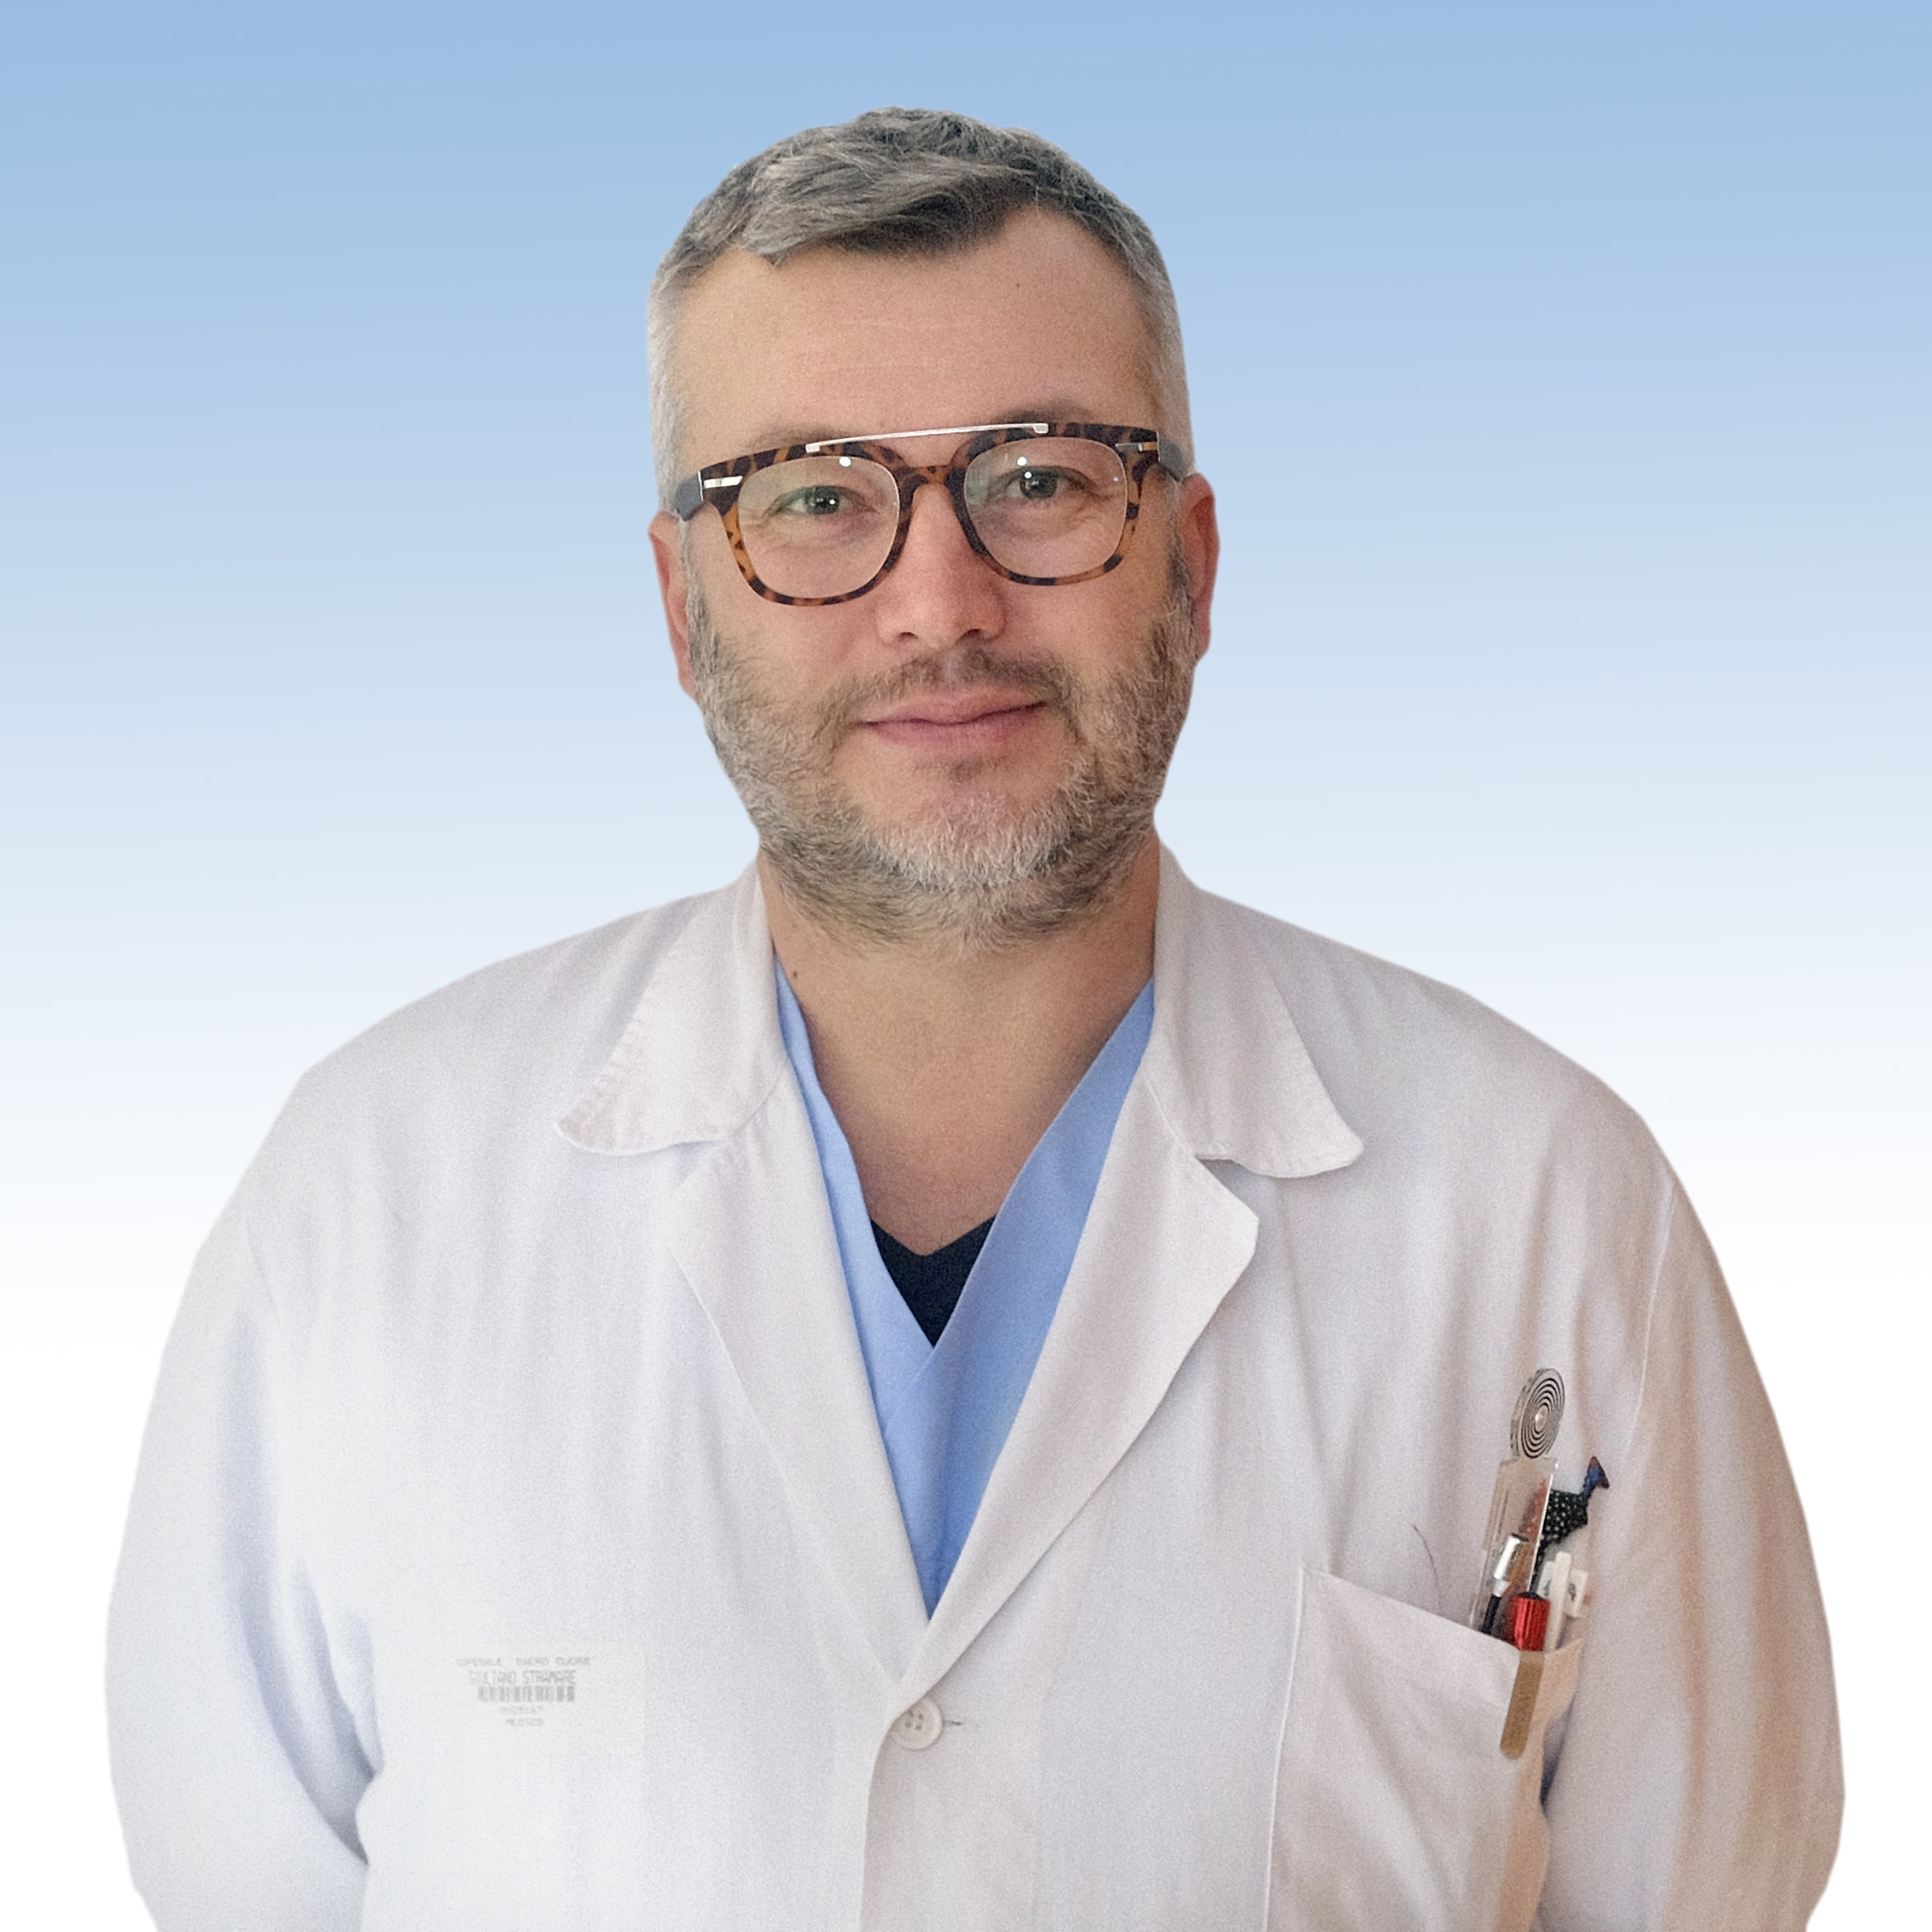 I nostri specialisti – IRCCS Ospedale Sacro Cuore Don Calabria